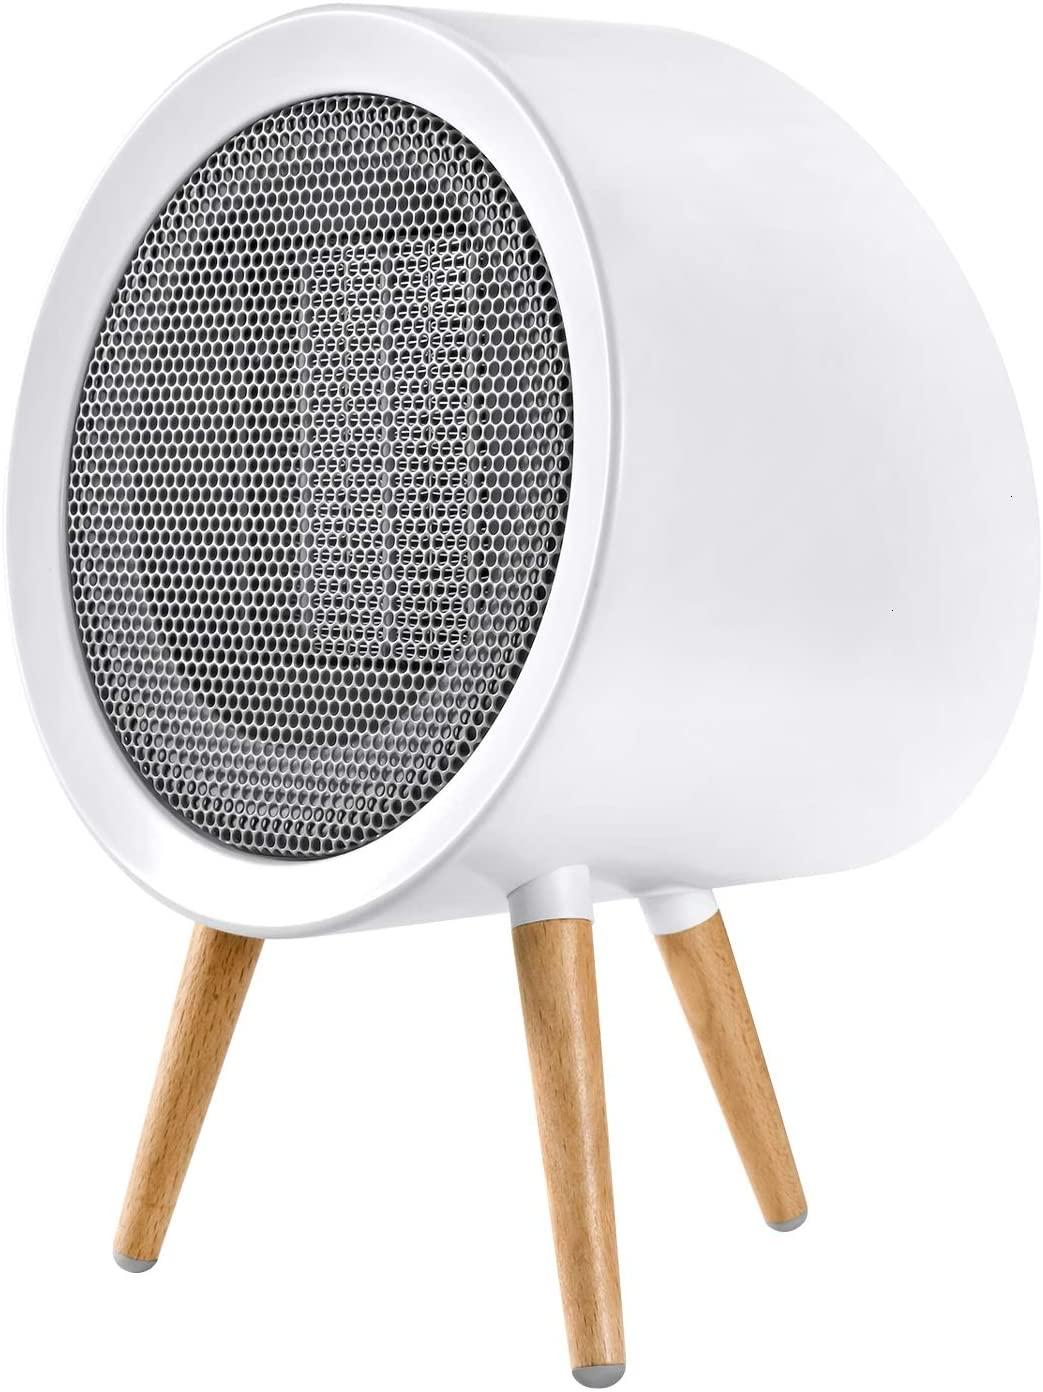 Modern Space Heater